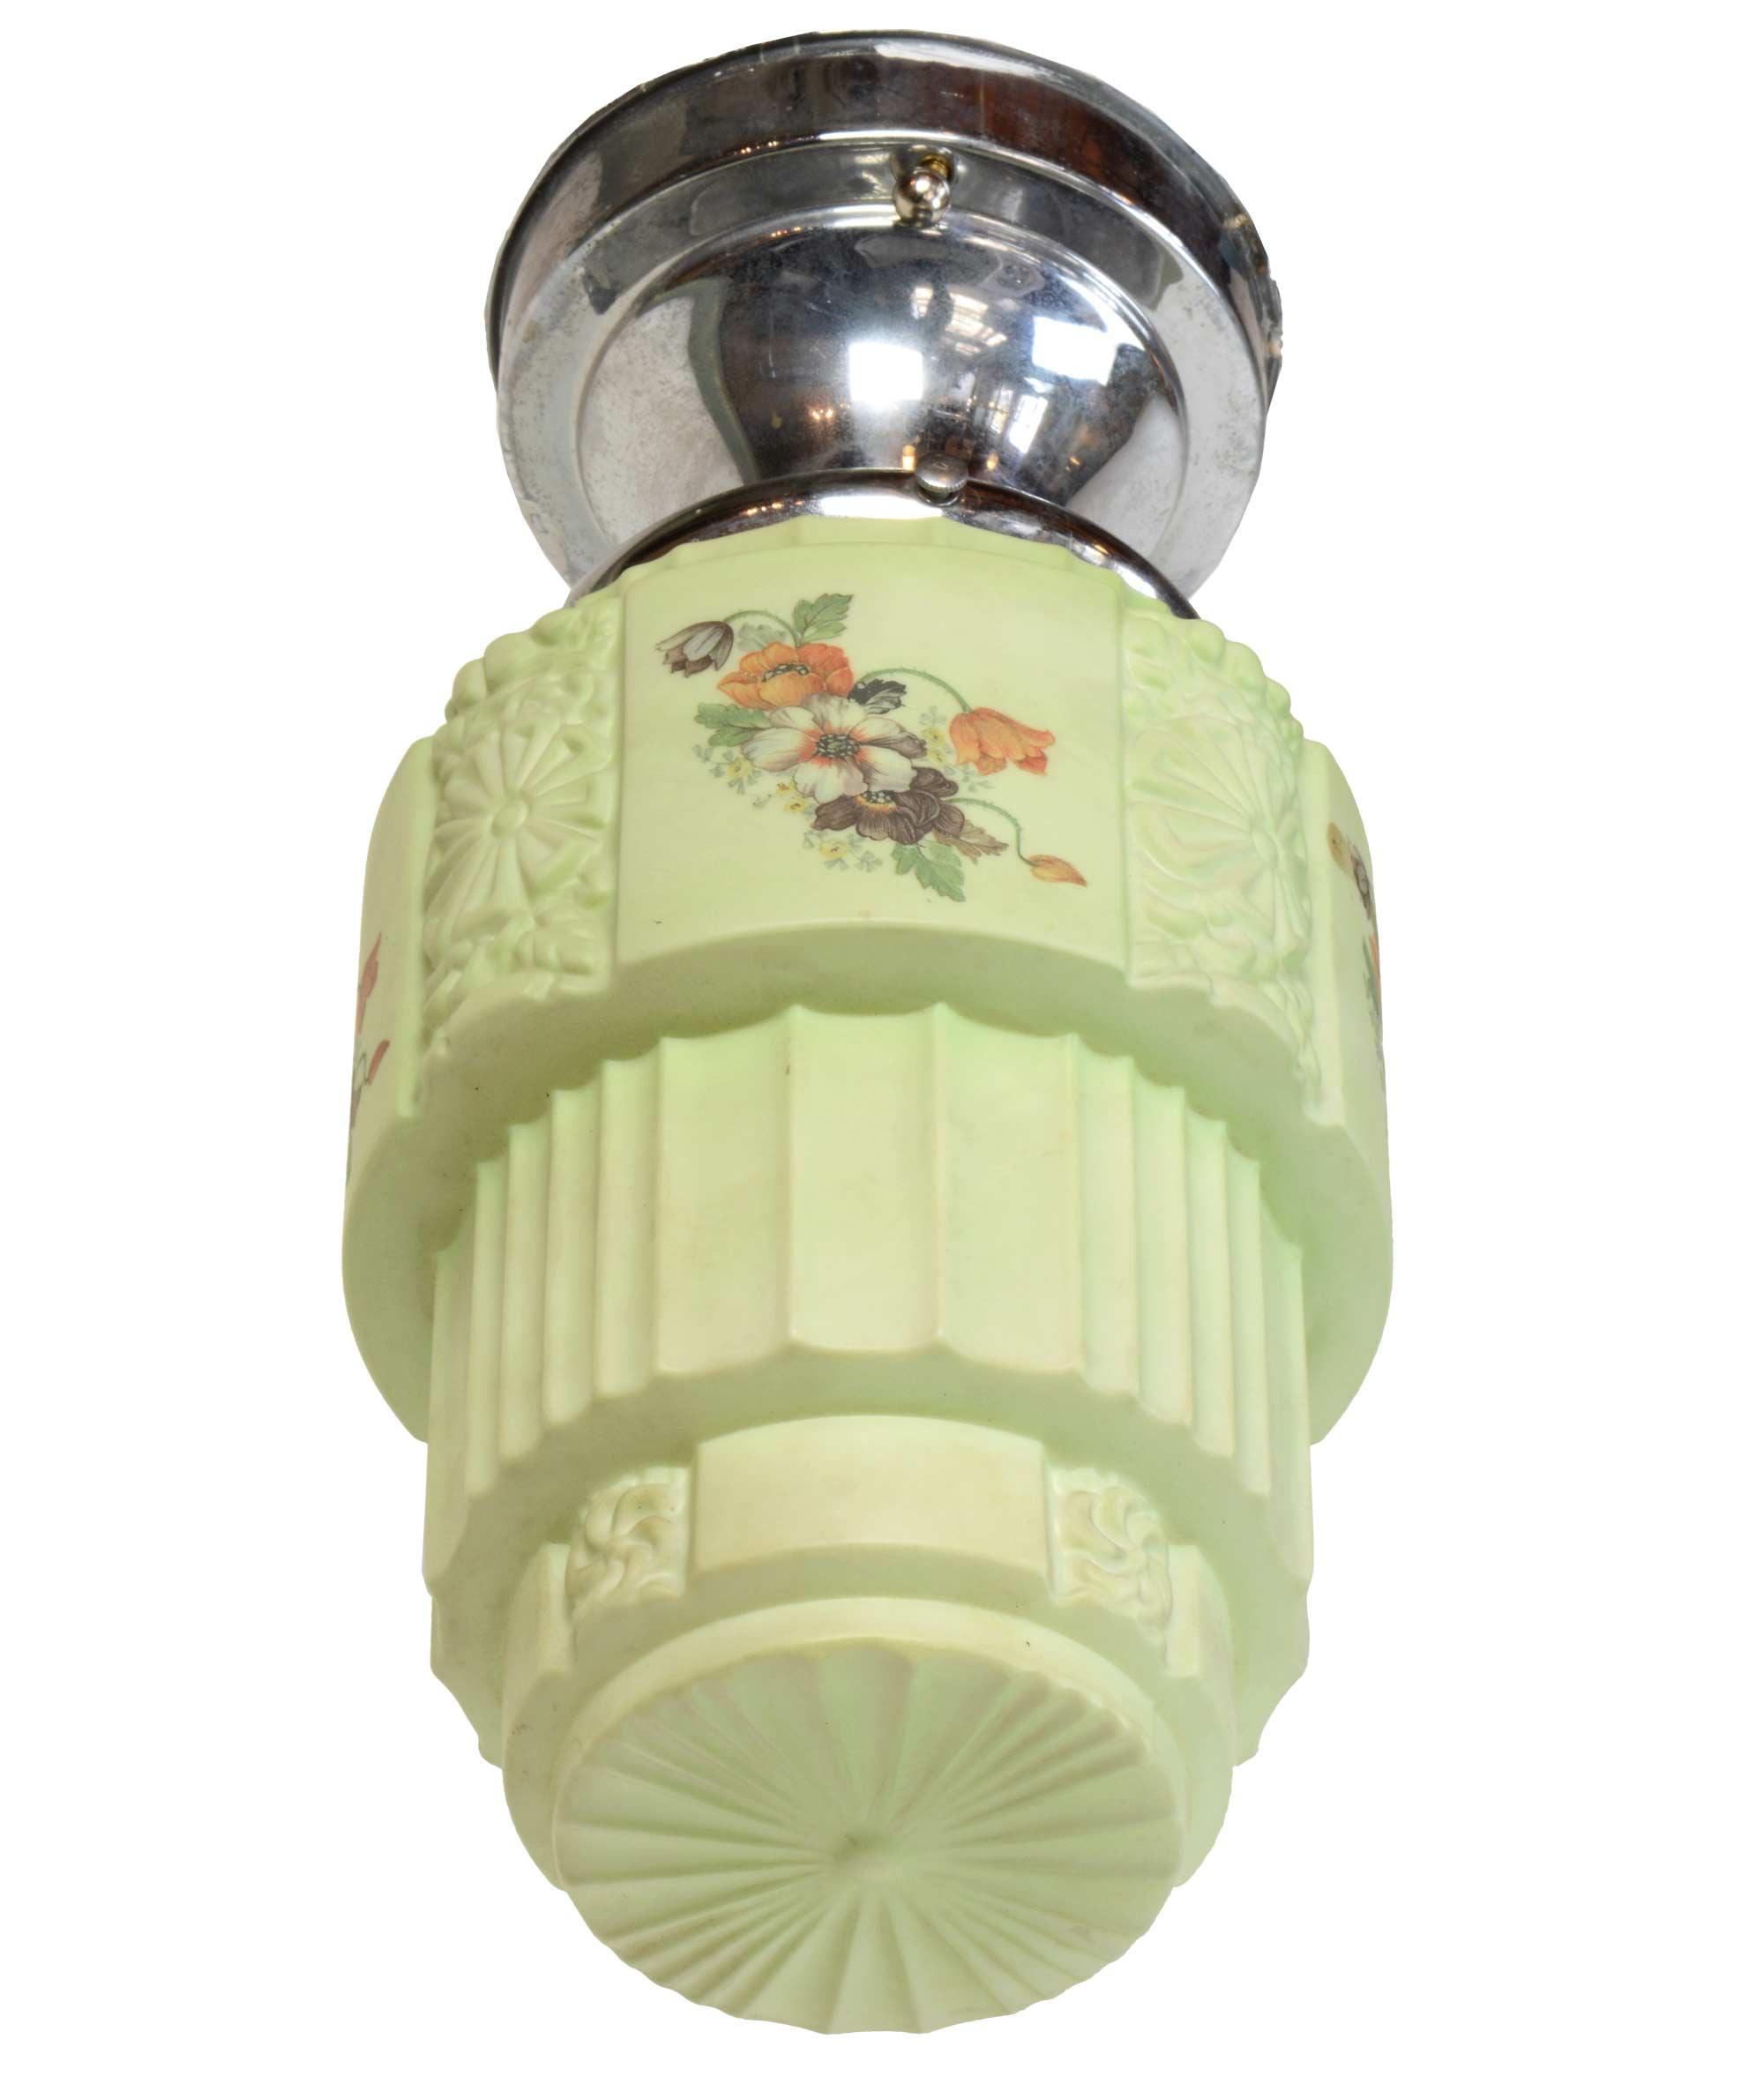 46666-green-floral-deco-flushmount-bottom.jpg